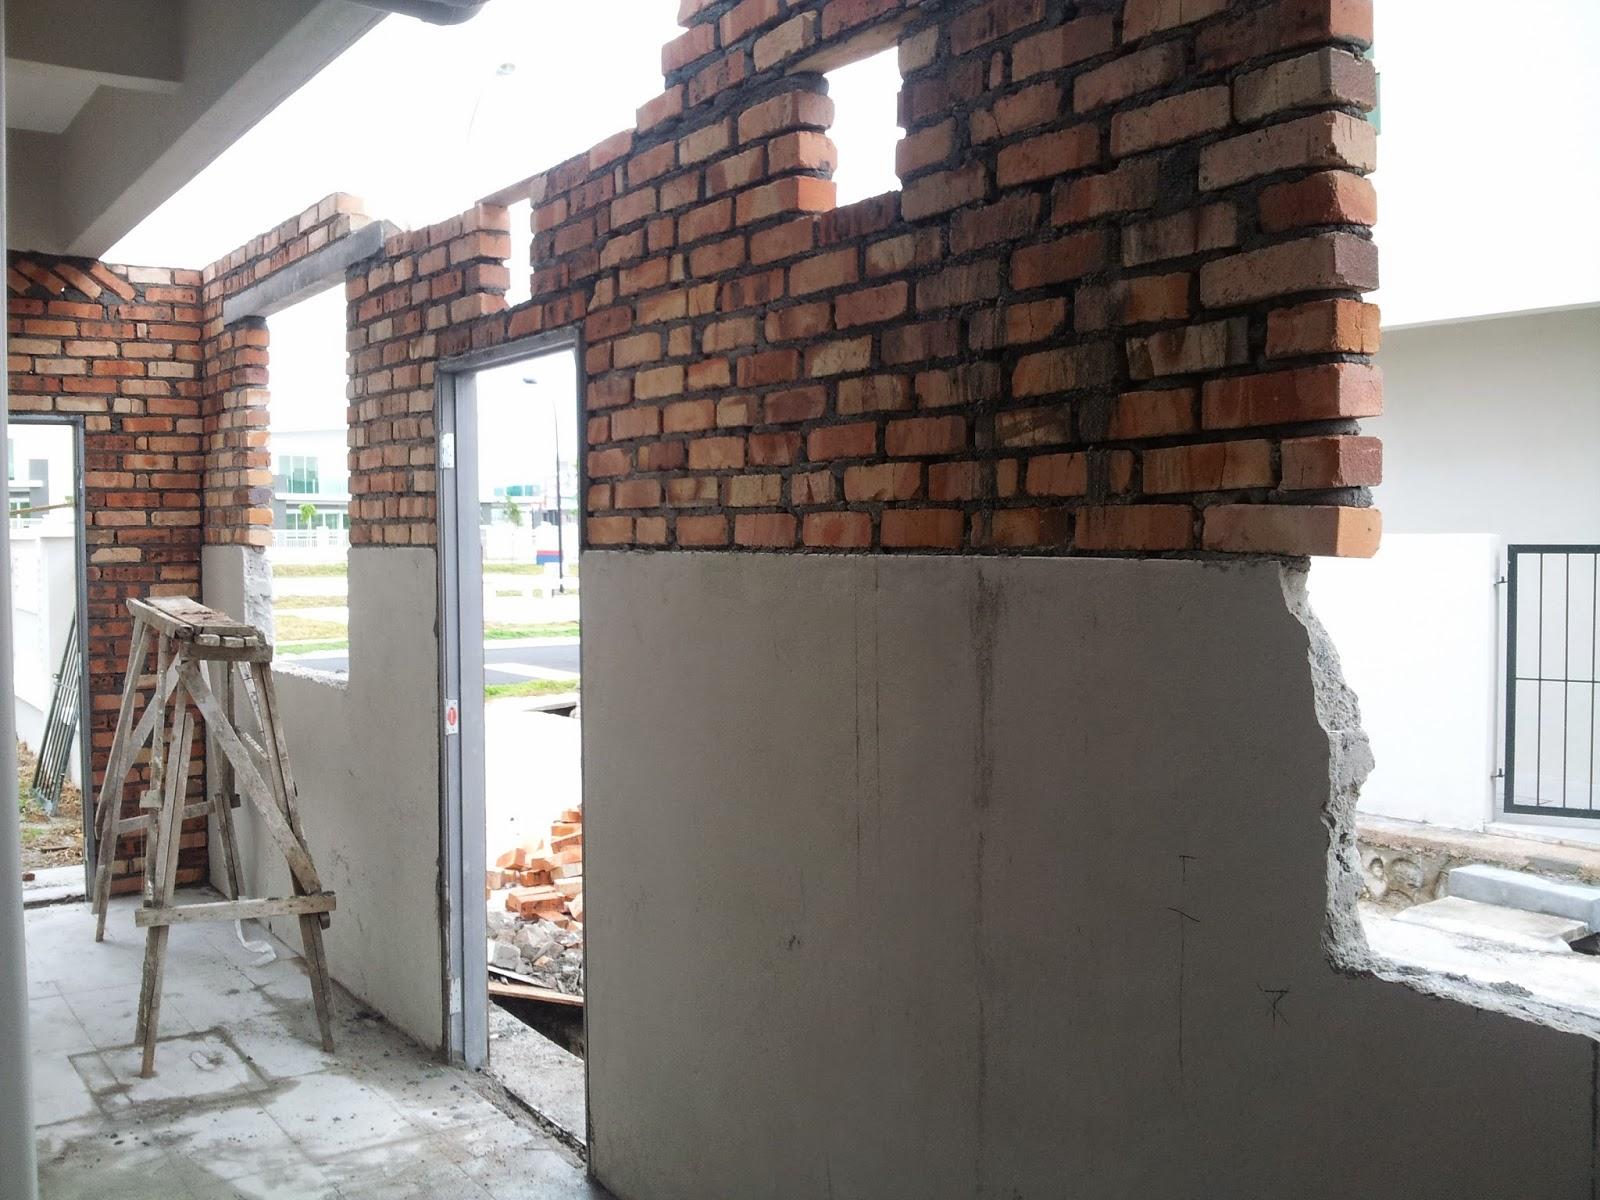 Asalnya Belakang Rumah Adalah Seperti Di Atas Kira Dah Ada Asas Bata Dan Dinding